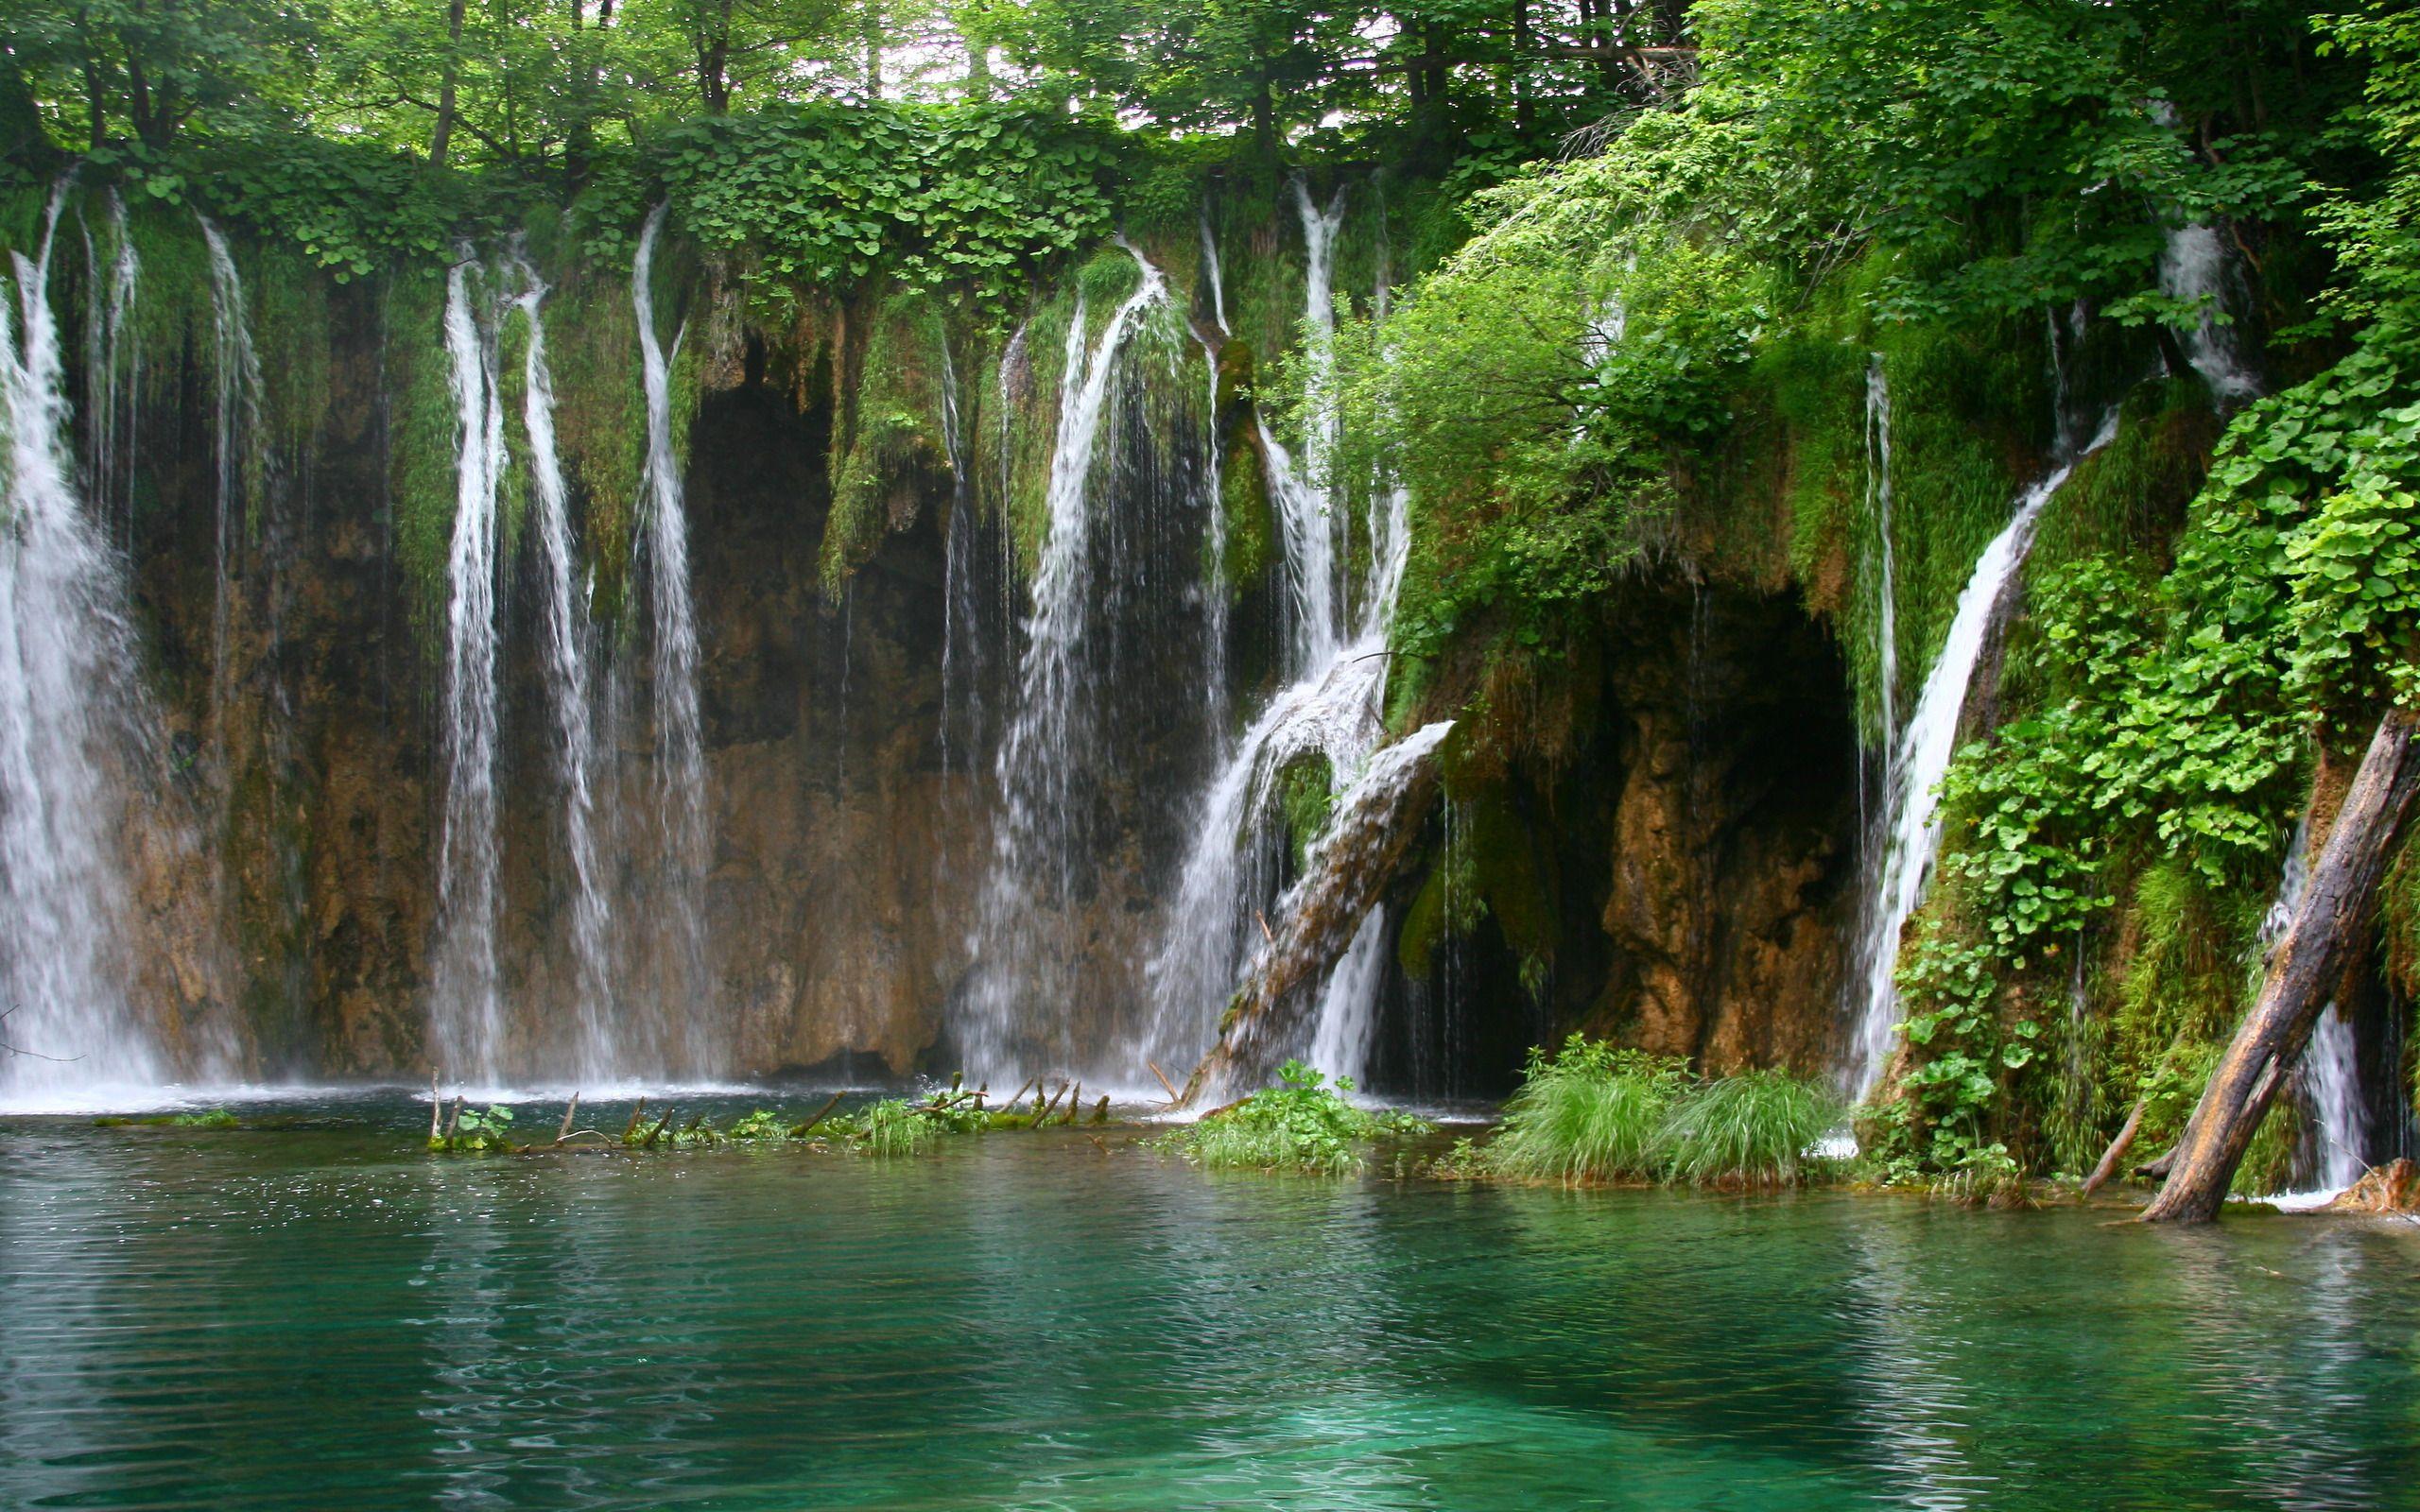 Good Wallpaper High Quality Waterfall - f72e32b66e961acdd7fd907ad26df91d  Snapshot_561785.jpg